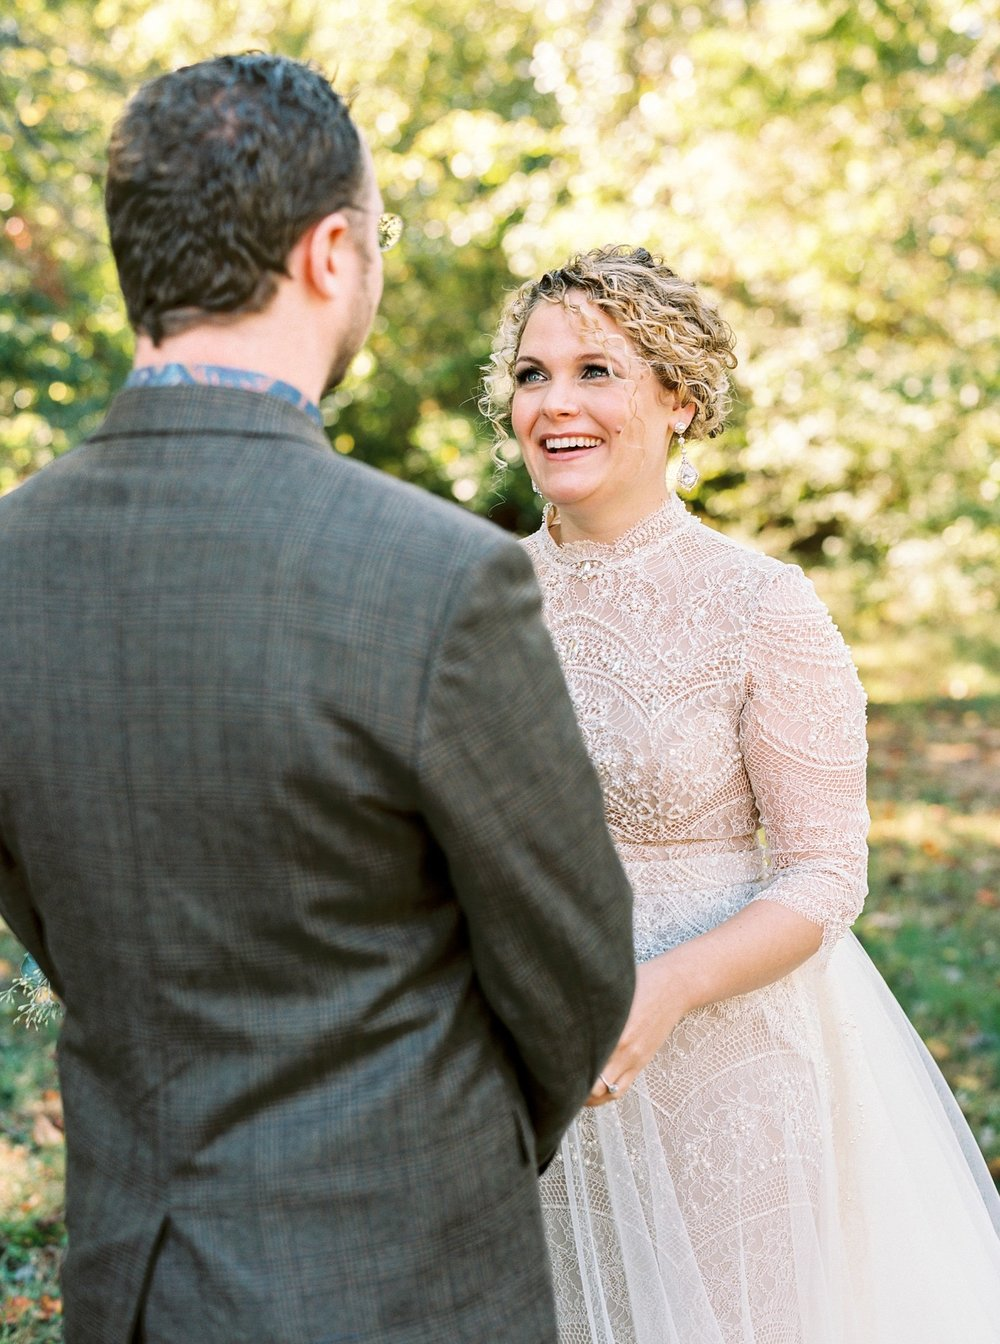 Perry Vaile Photography  | Wedding at  WinMock  in Bermuda Run, North Carolina